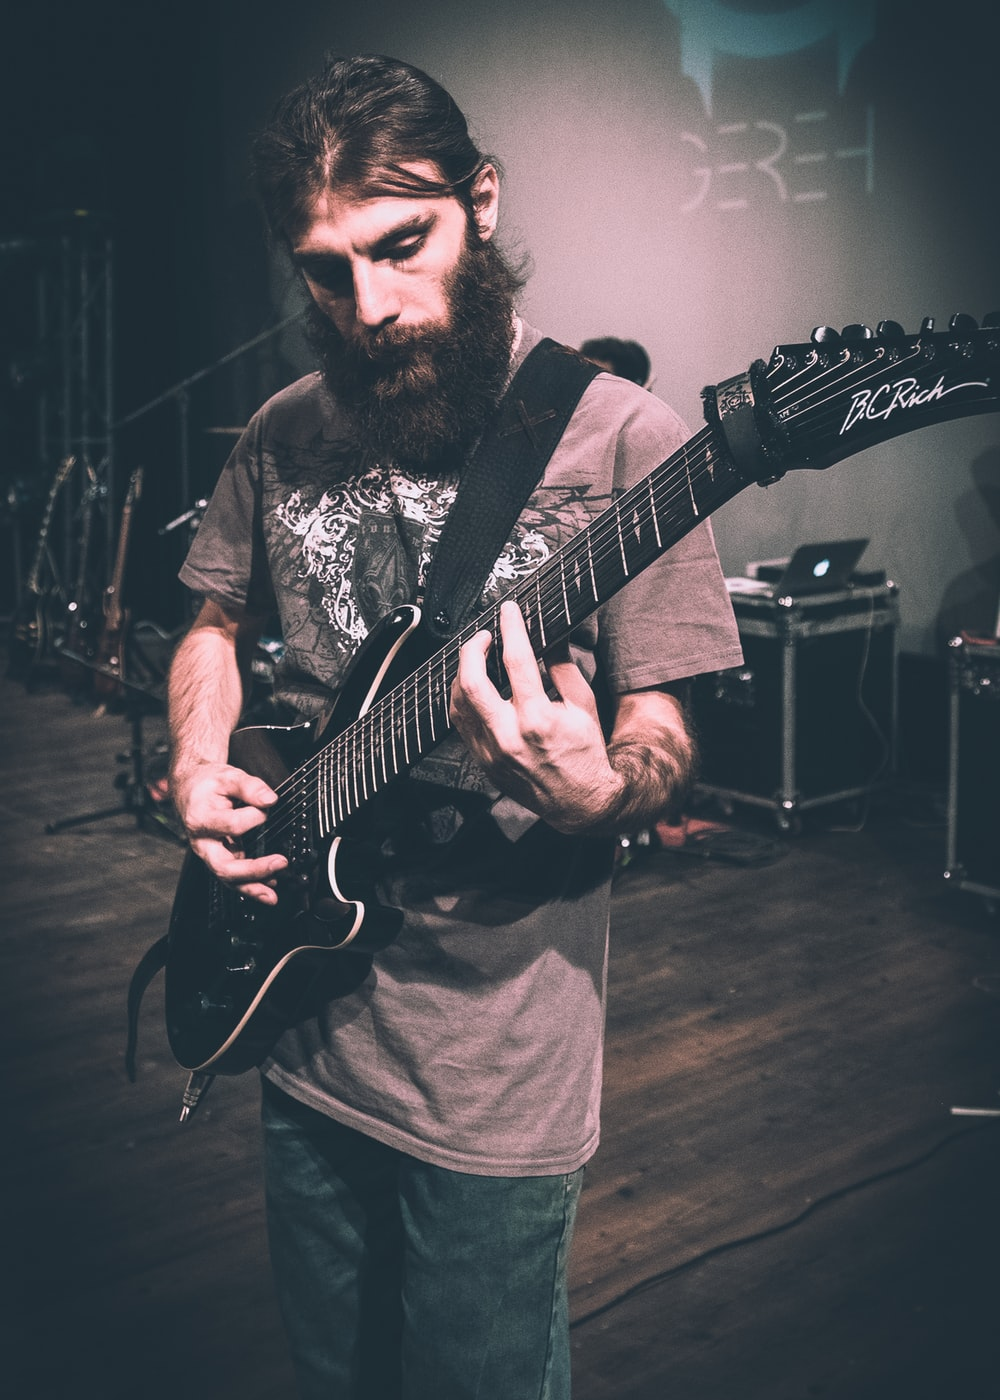 man in gray crew neck shirt playing electric guitar